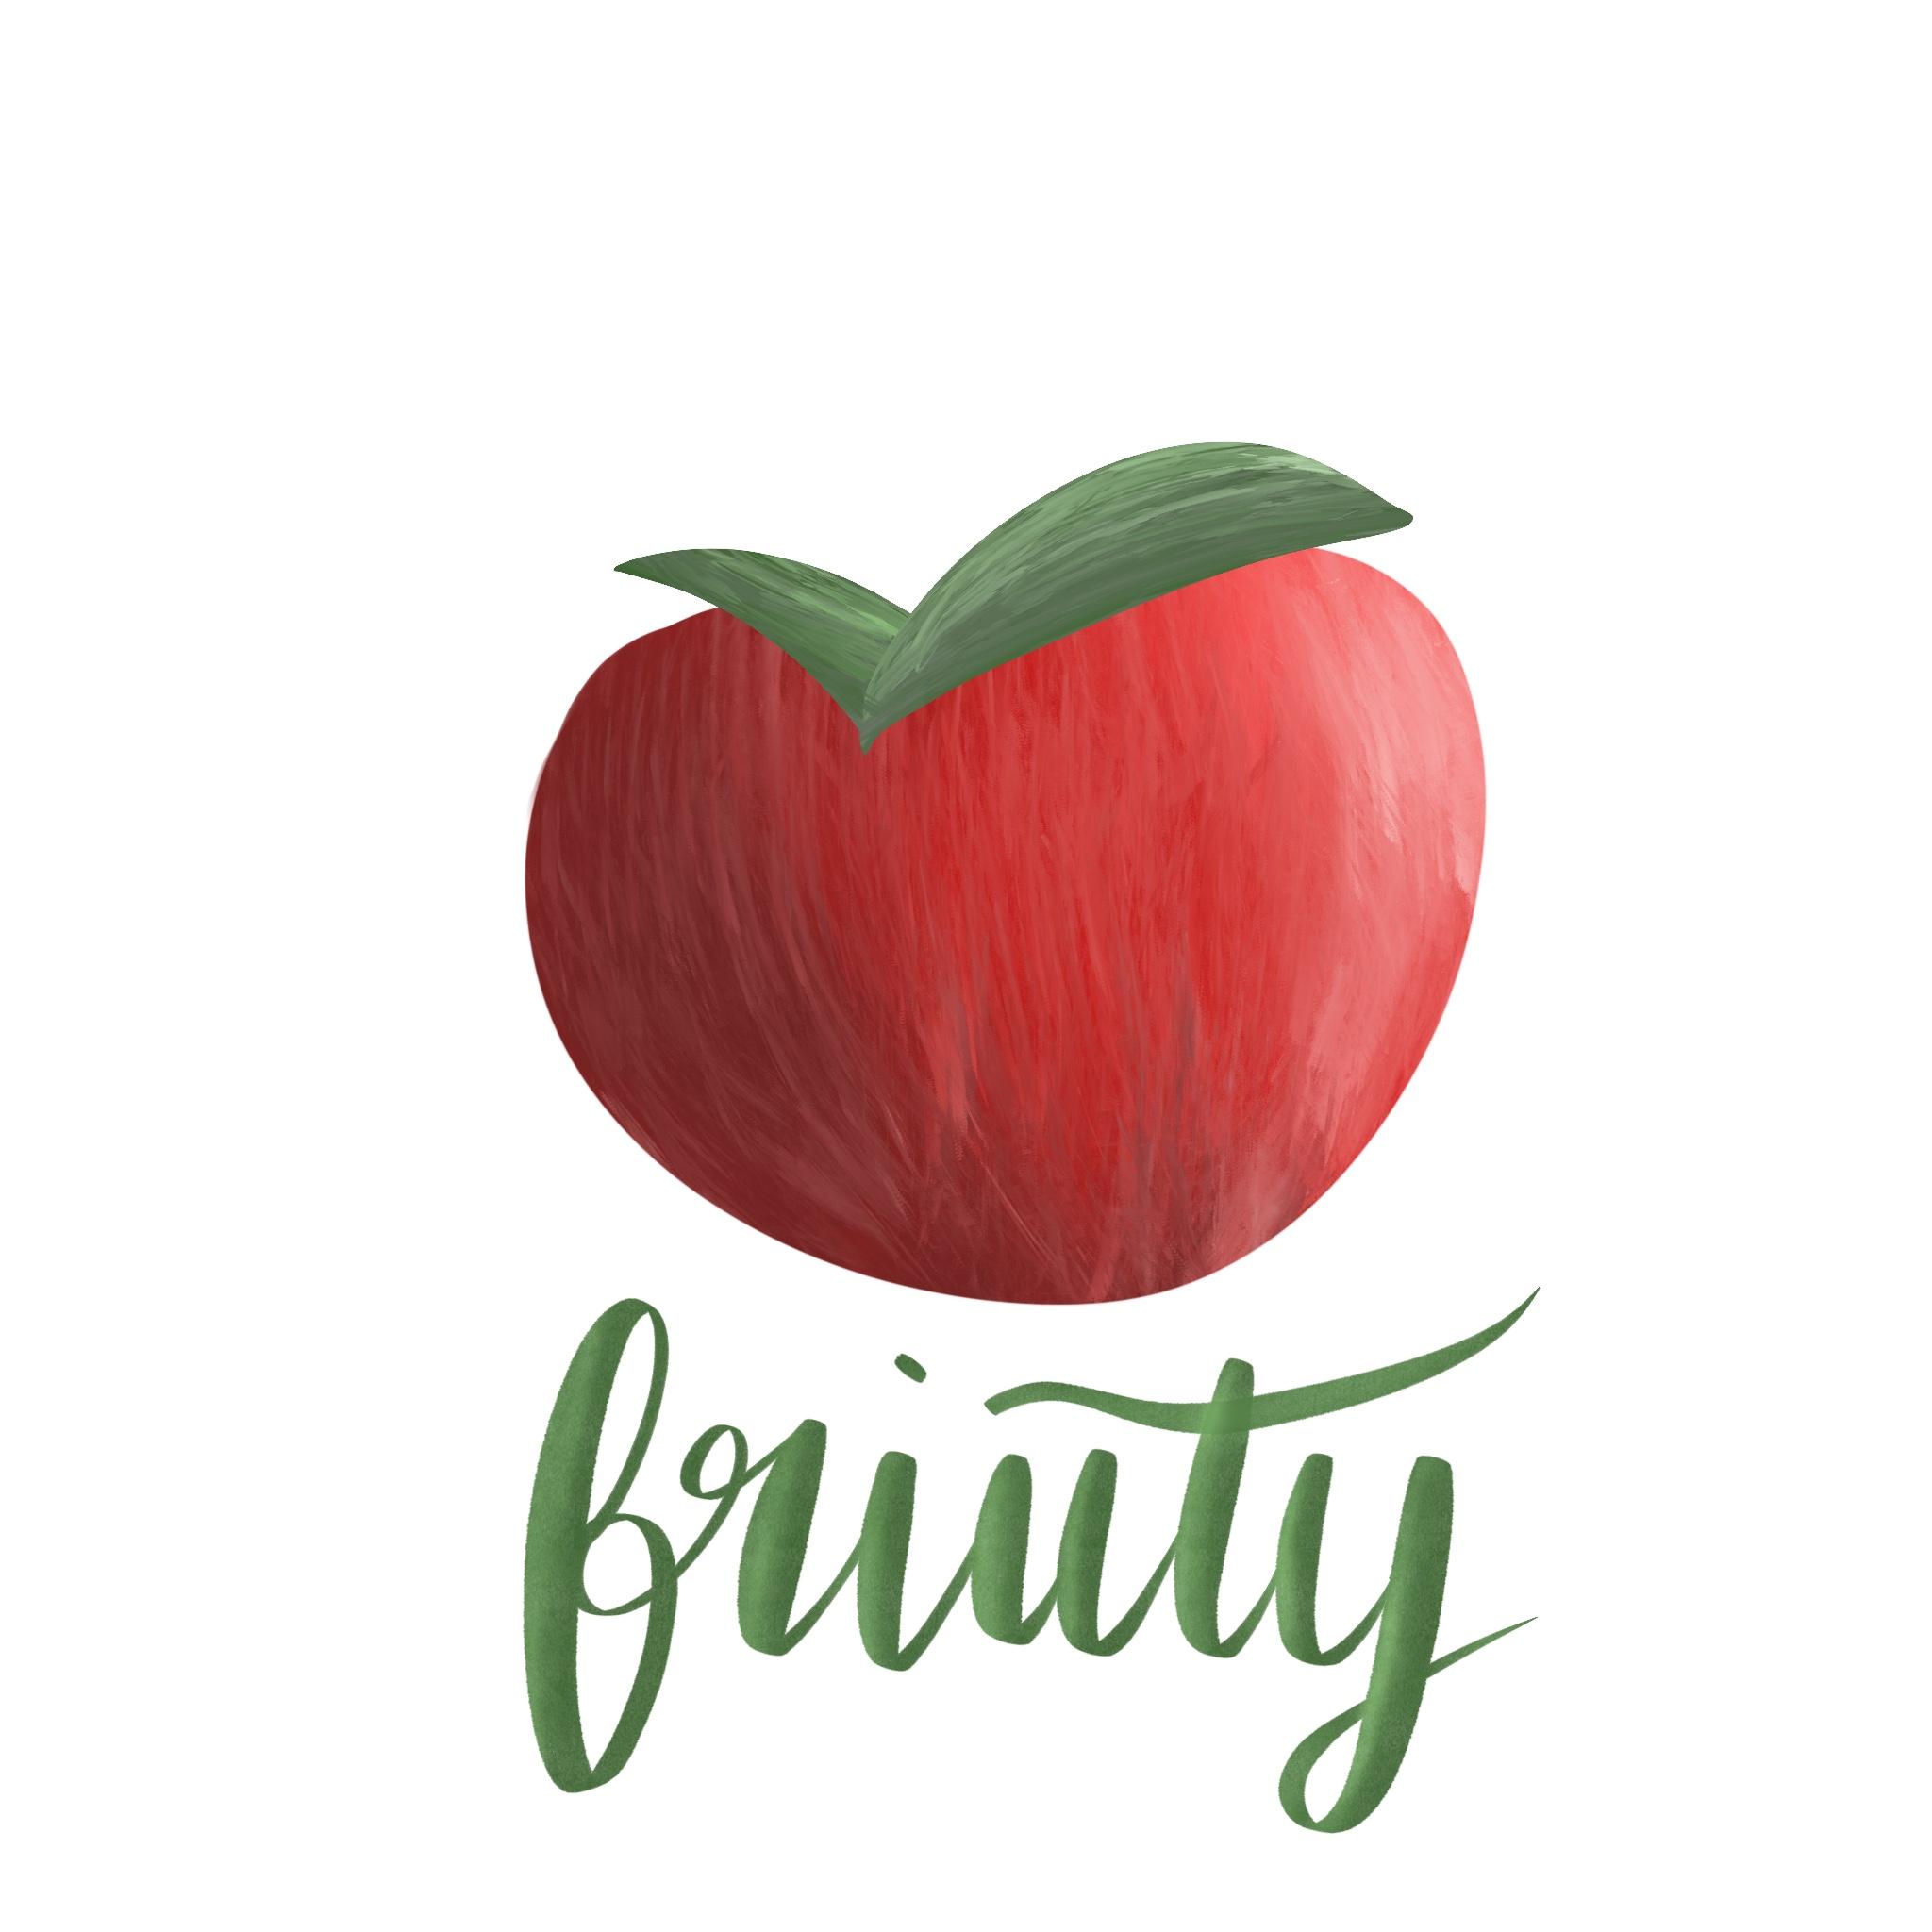 «Fruity» 😎 Hahah.